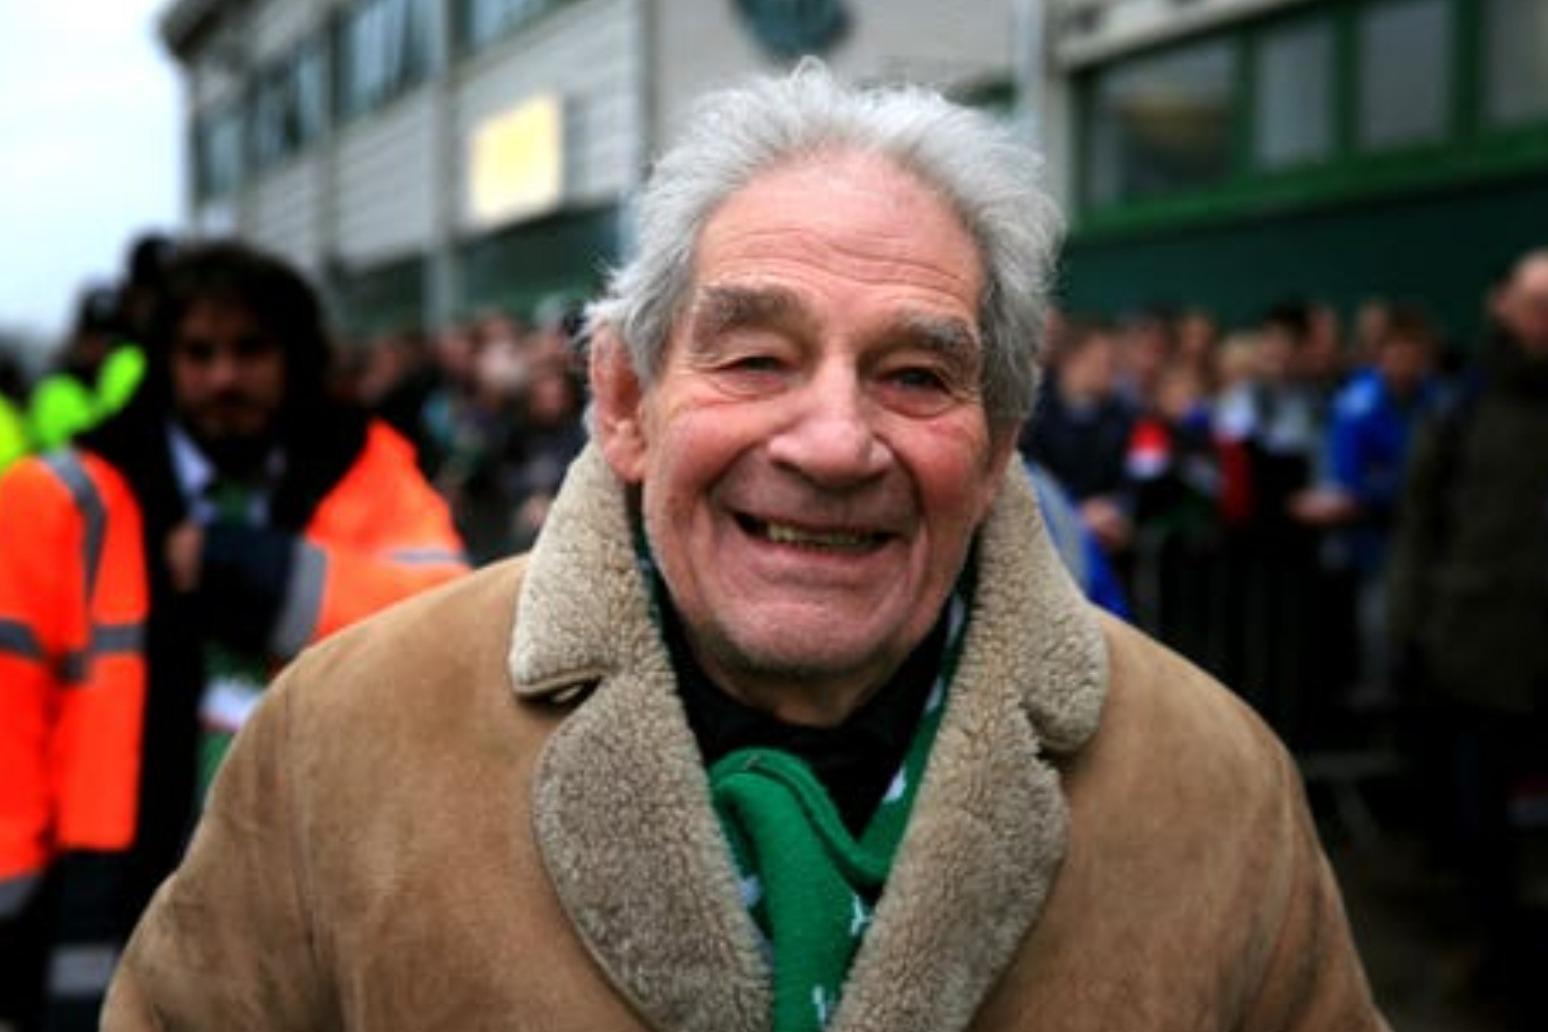 Vicar Of Dibley star Trevor Peacock dies aged 89